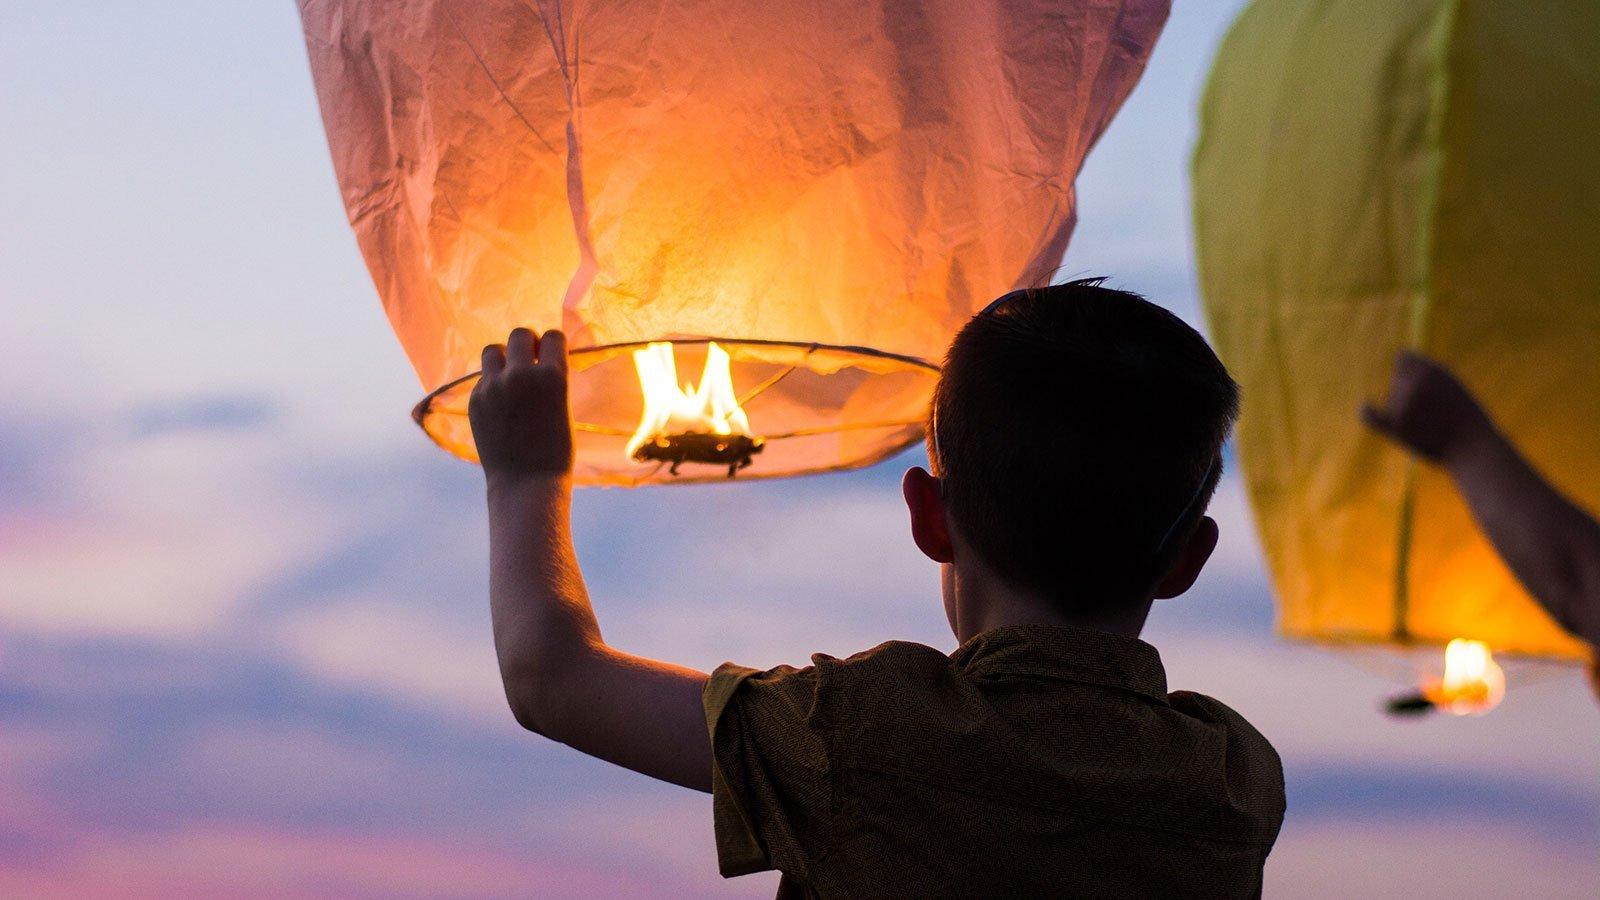 Byg din egen varmluftballon. Foto: Gianandrea Villa / Unspash